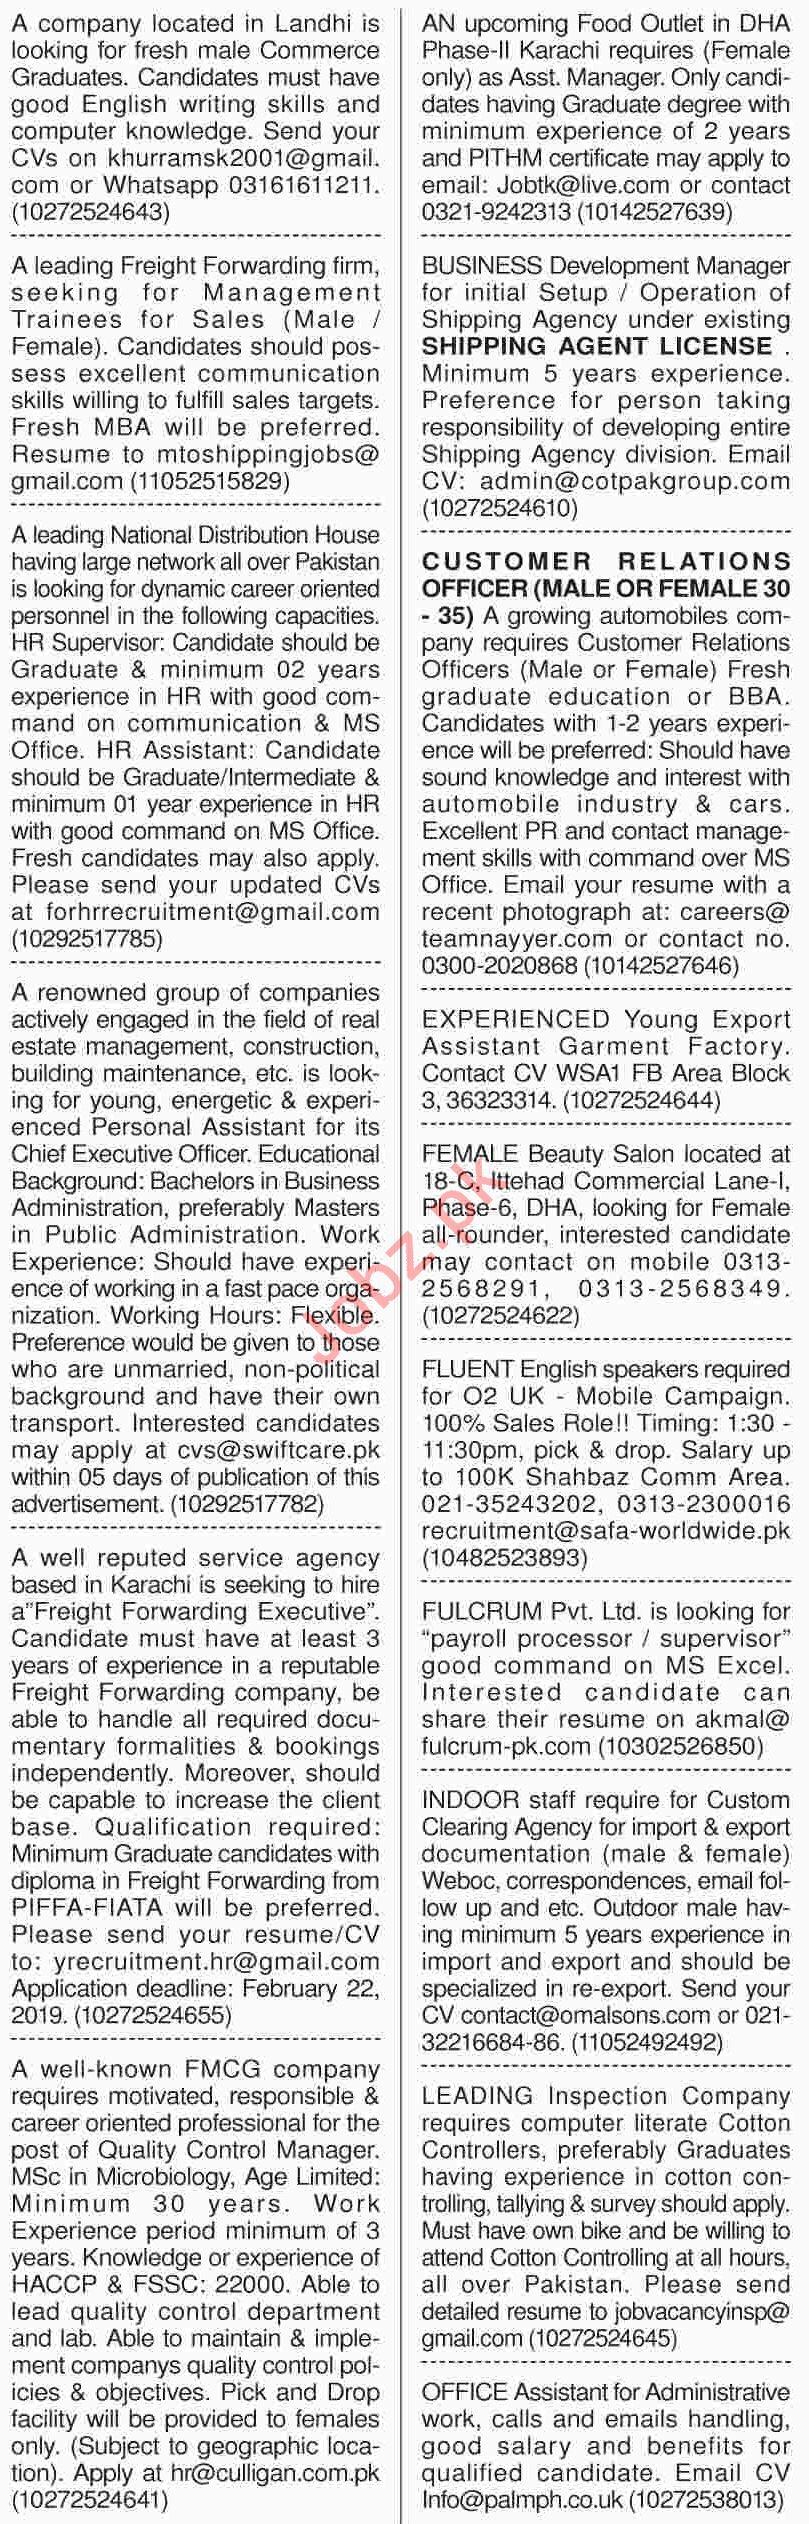 Dawn Sunday Classified Ads 17th Feb 2019 for General Staff